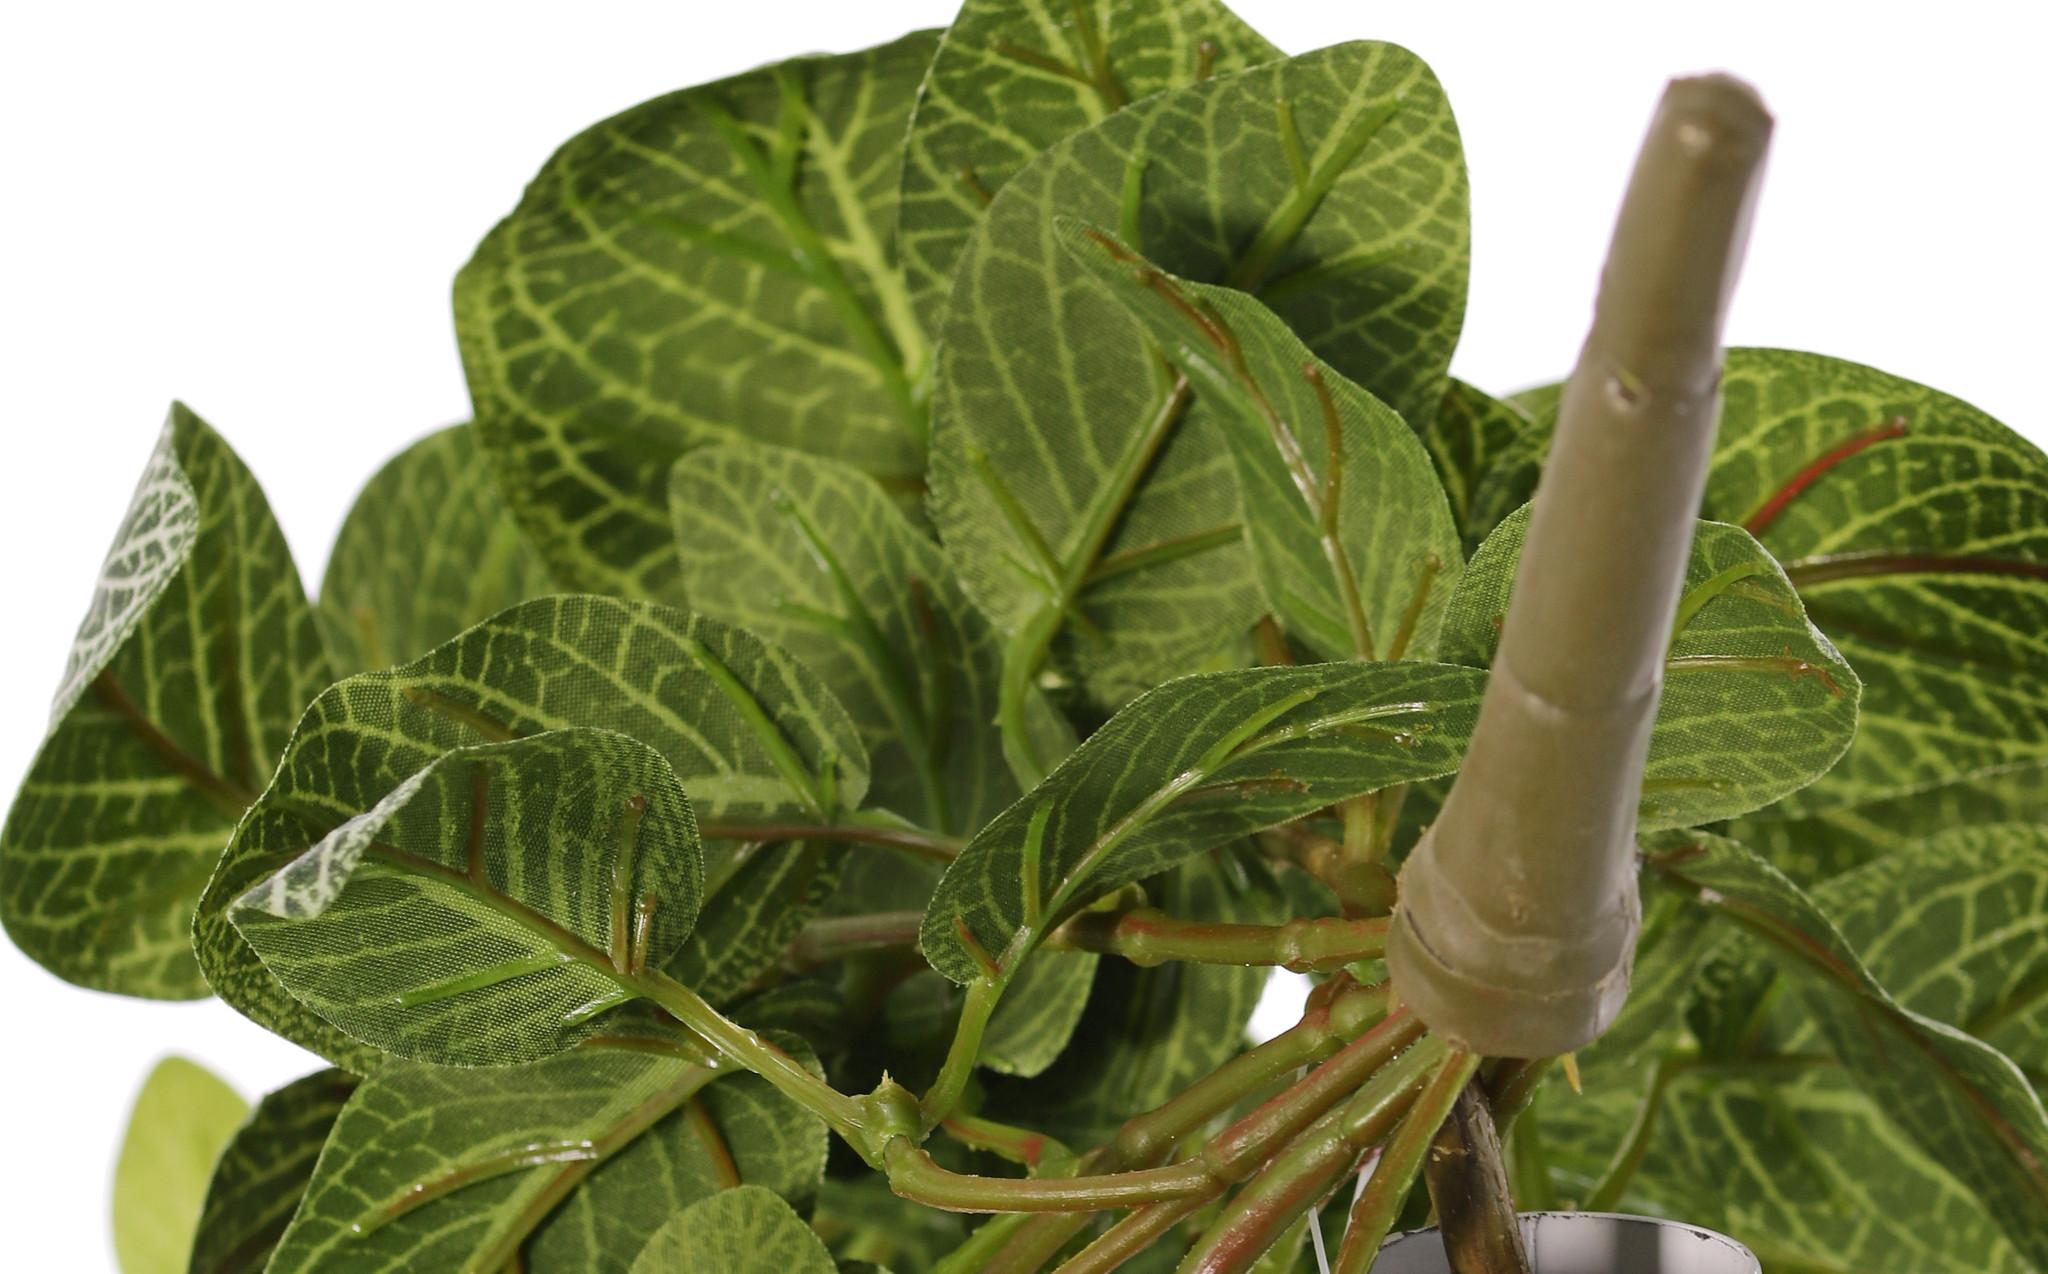 Fittonia (nerve plant), 'Top Green', 178 lvs., FR & UVsafe, 75cm